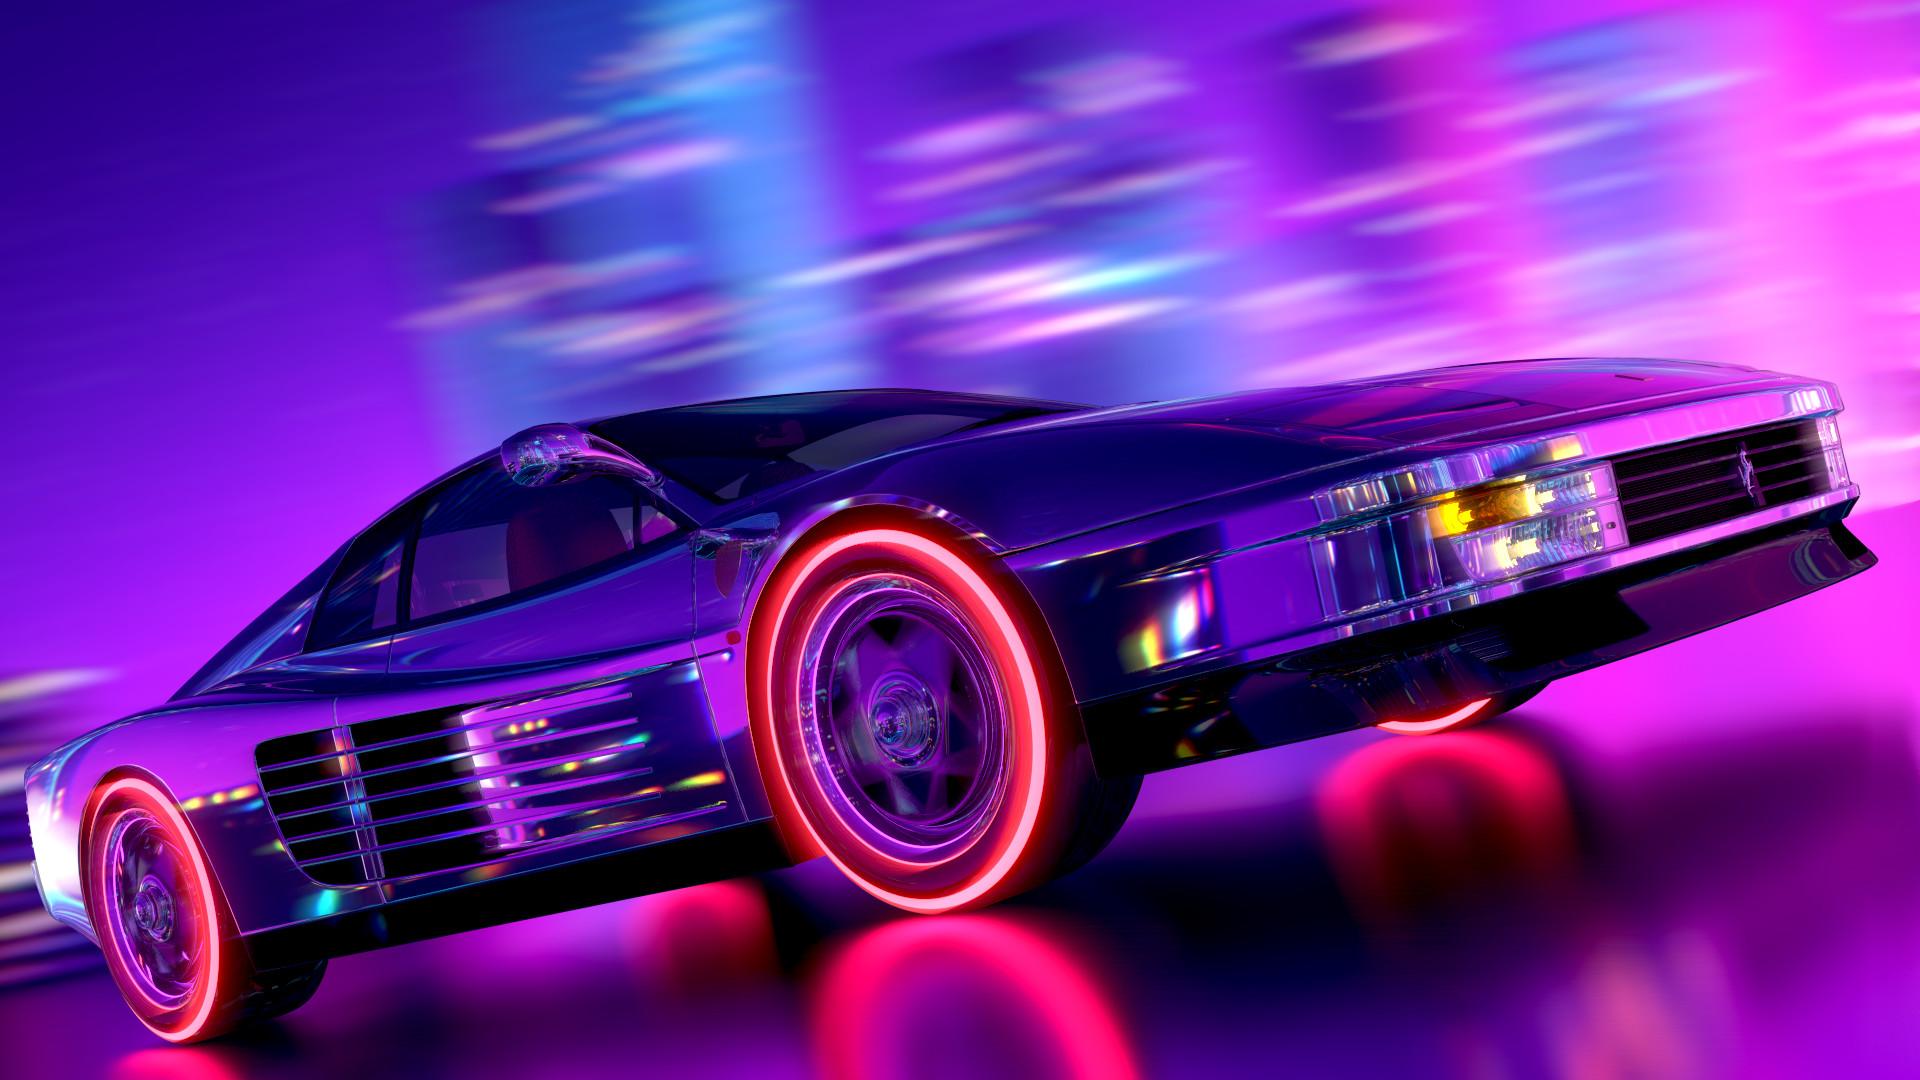 Mustang Car Wallpaper Desktop Arslan Safiullin Ferrari Testarossa Retrowave Style